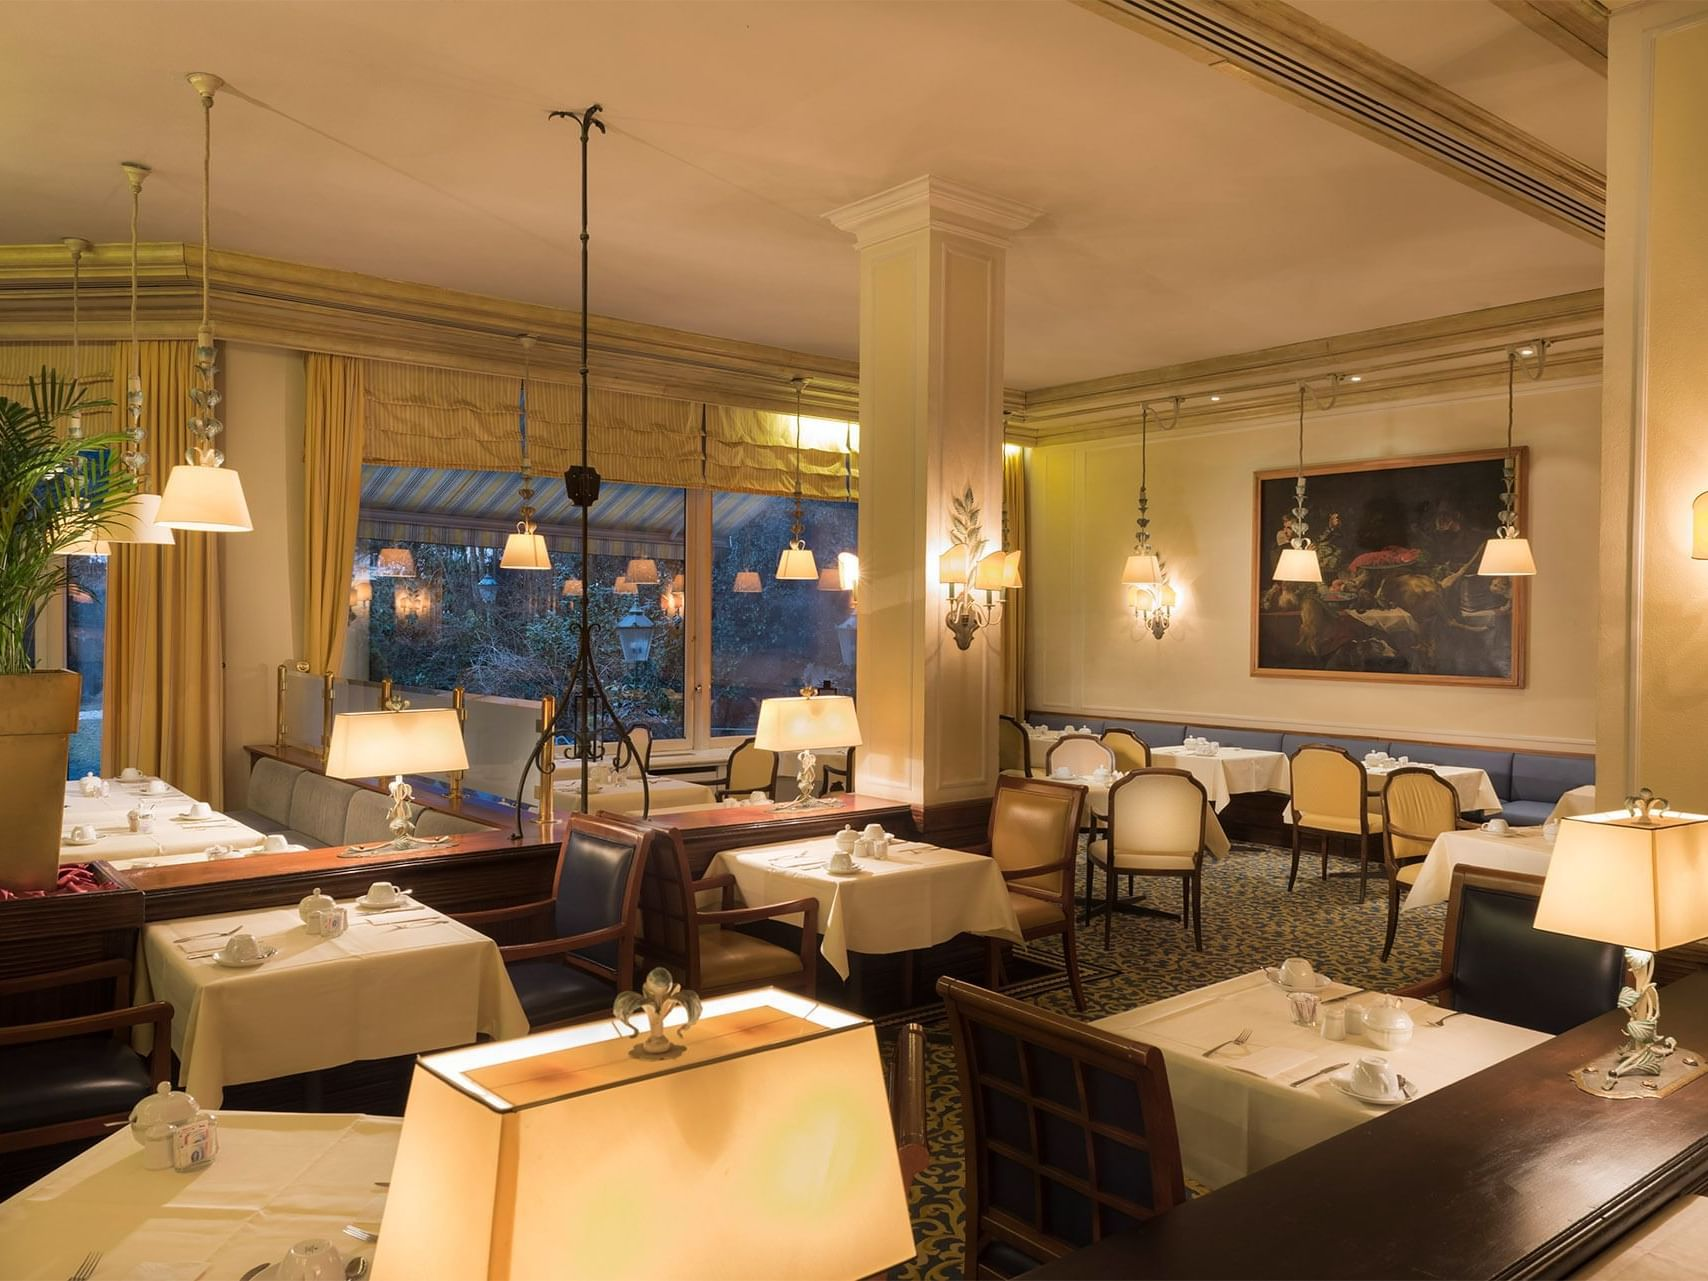 Interior of Park Restaurant at Precise Bad Reichenhall Bavaria